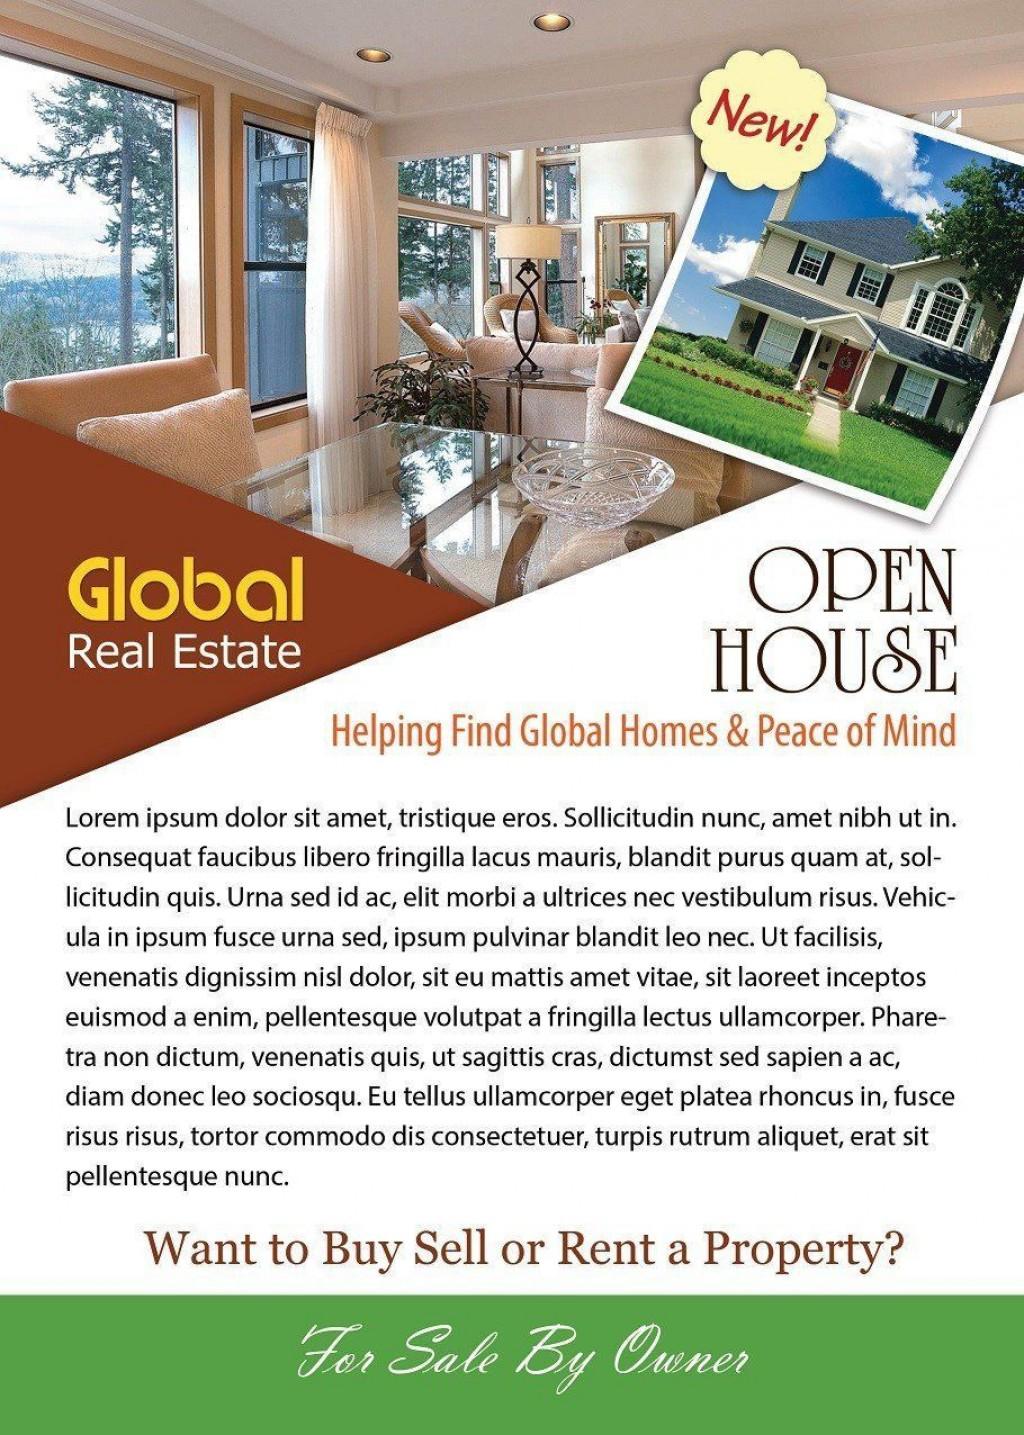 004 Phenomenal Free Open House Flyer Template High Def  Microsoft WordLarge